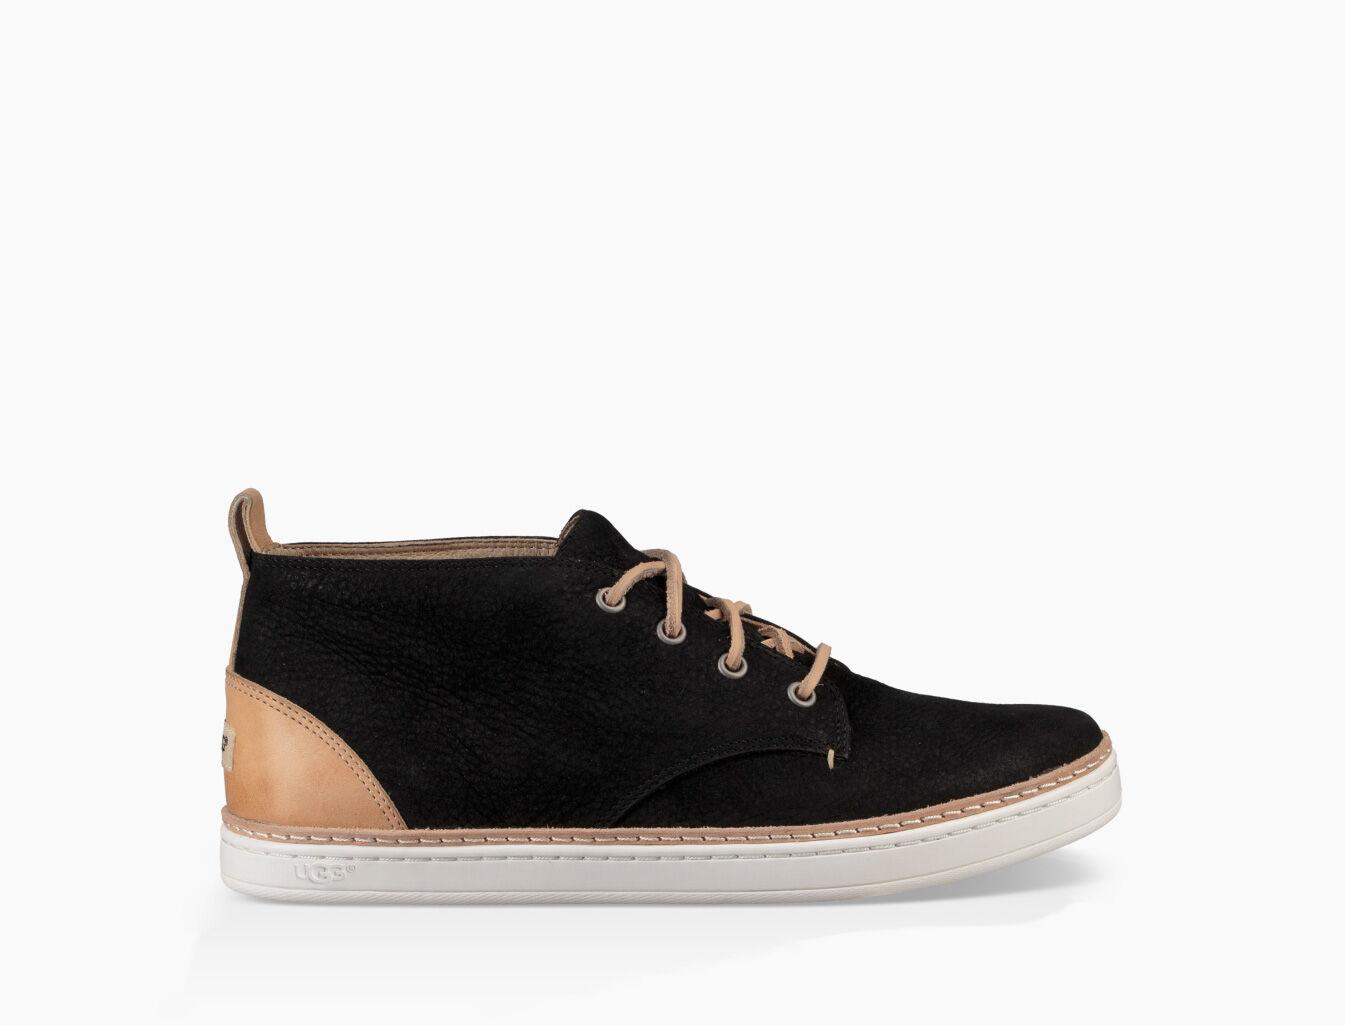 UGG® Kallisto Shoes for Women   UGG